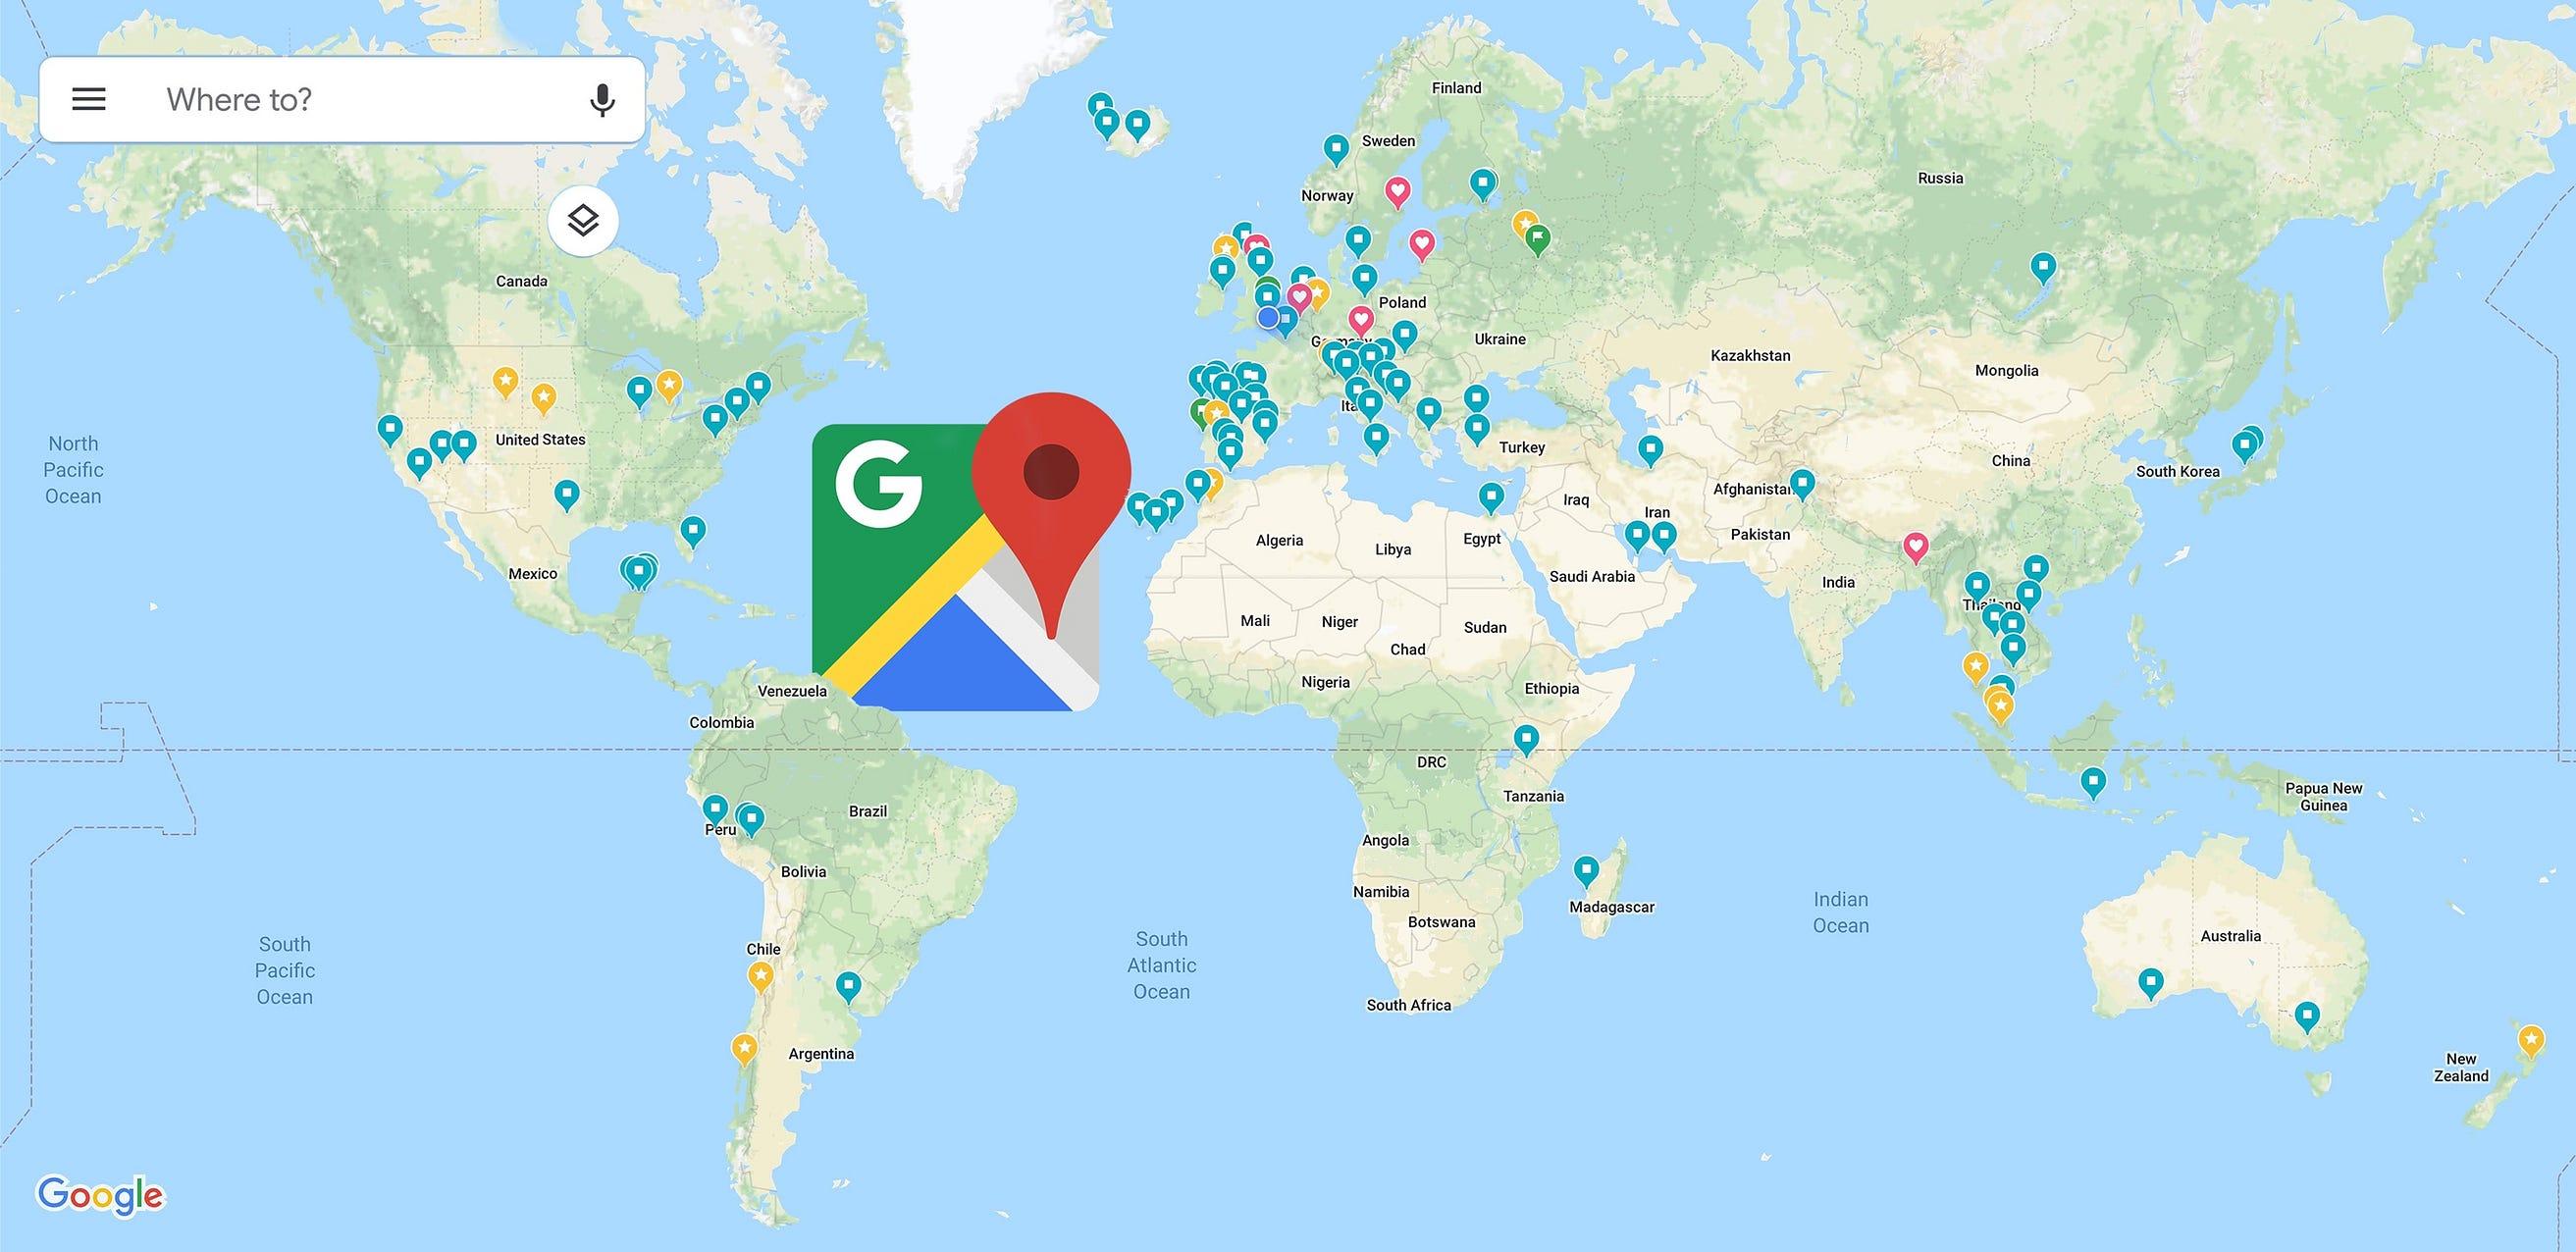 Australia Map Google.Maps Google